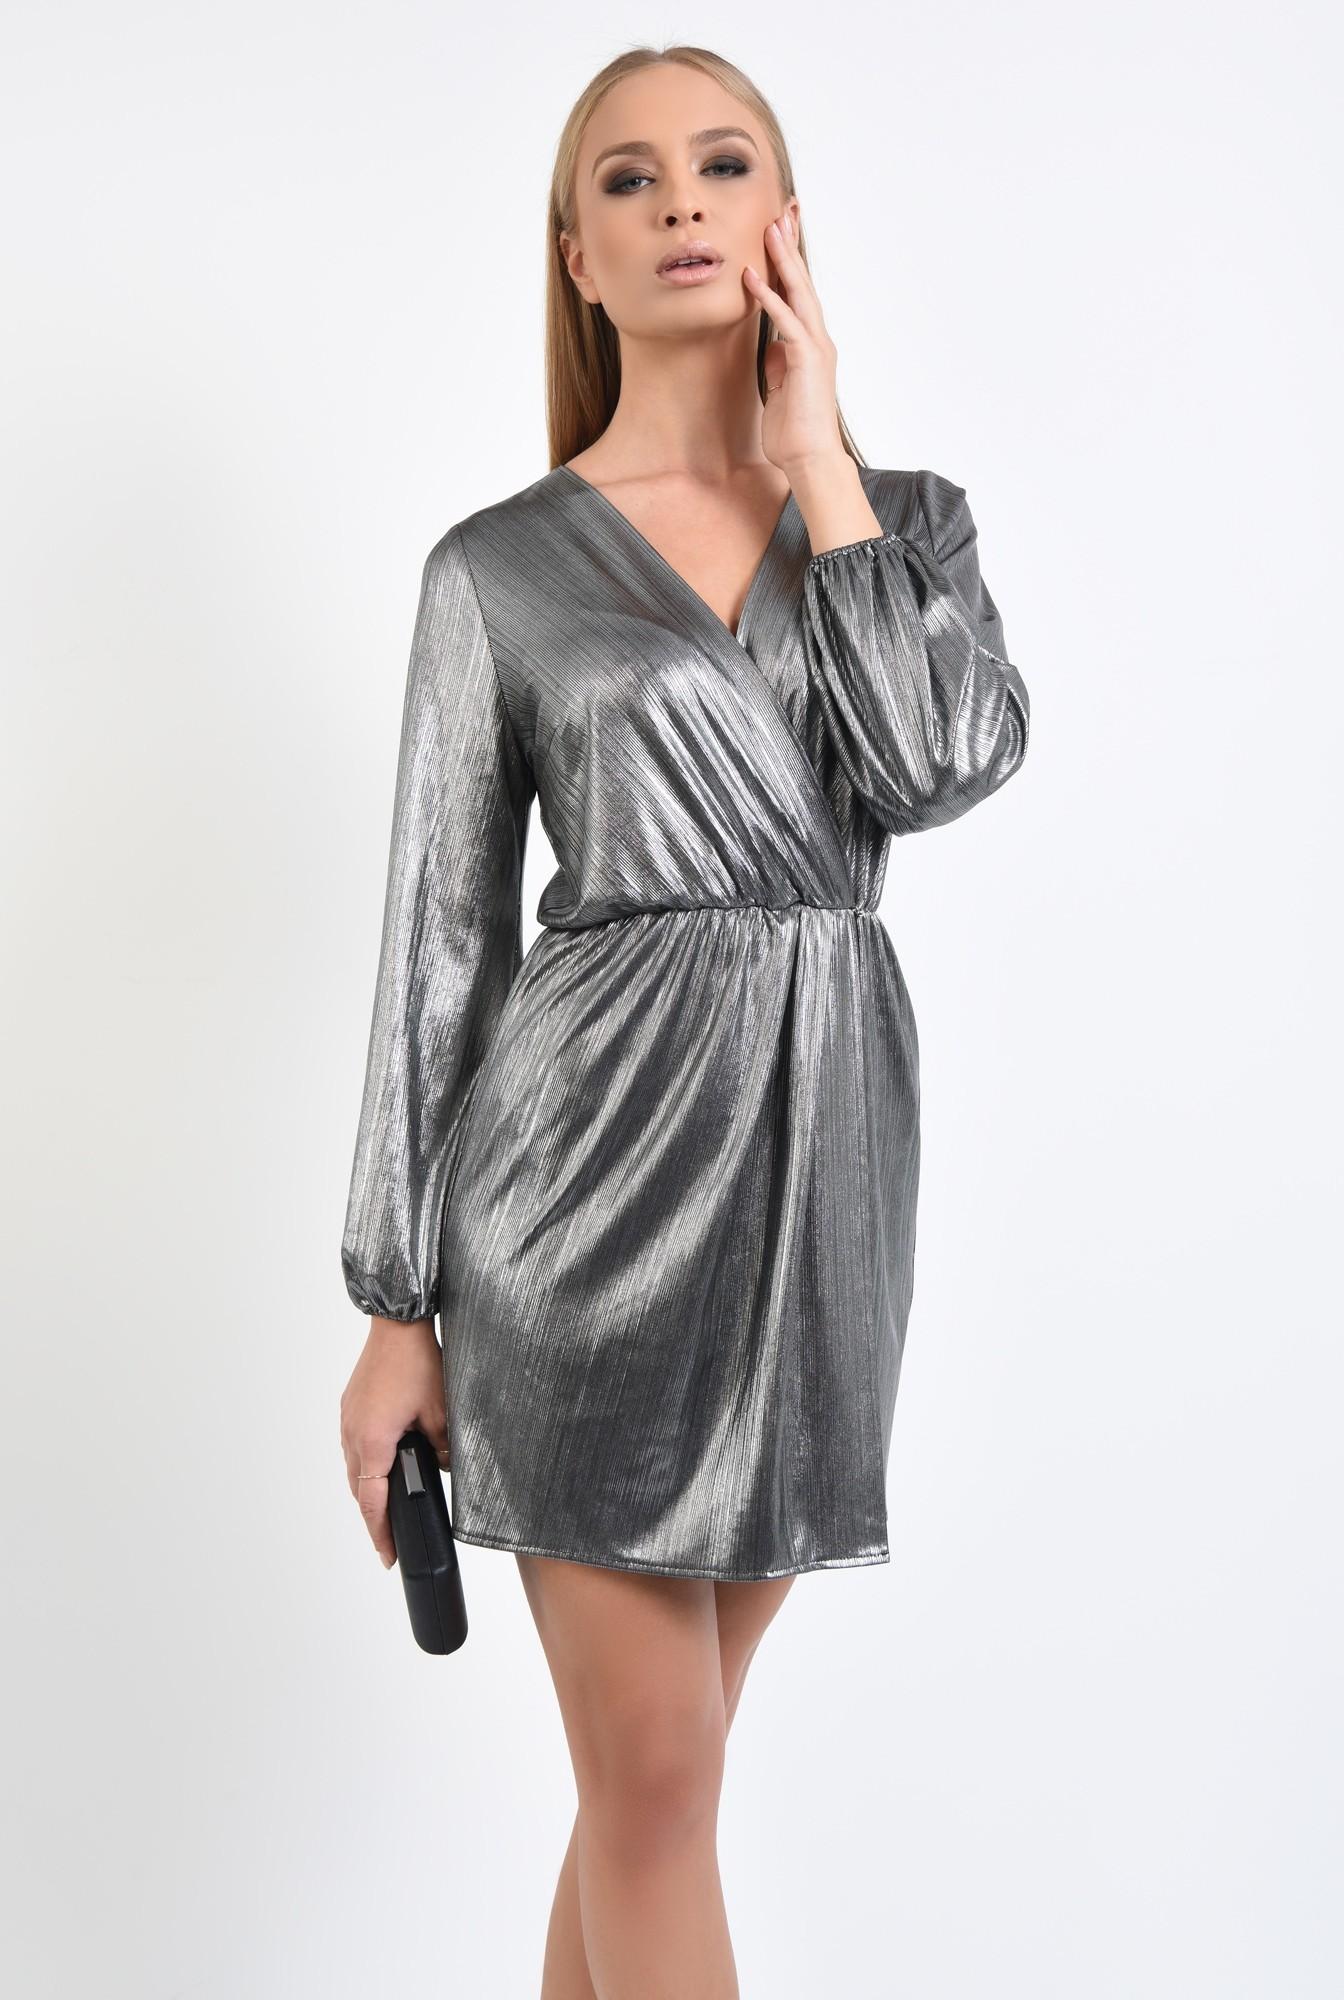 2 - rochie de seara, lurex argintiu, talie elastica, anchior petrecut